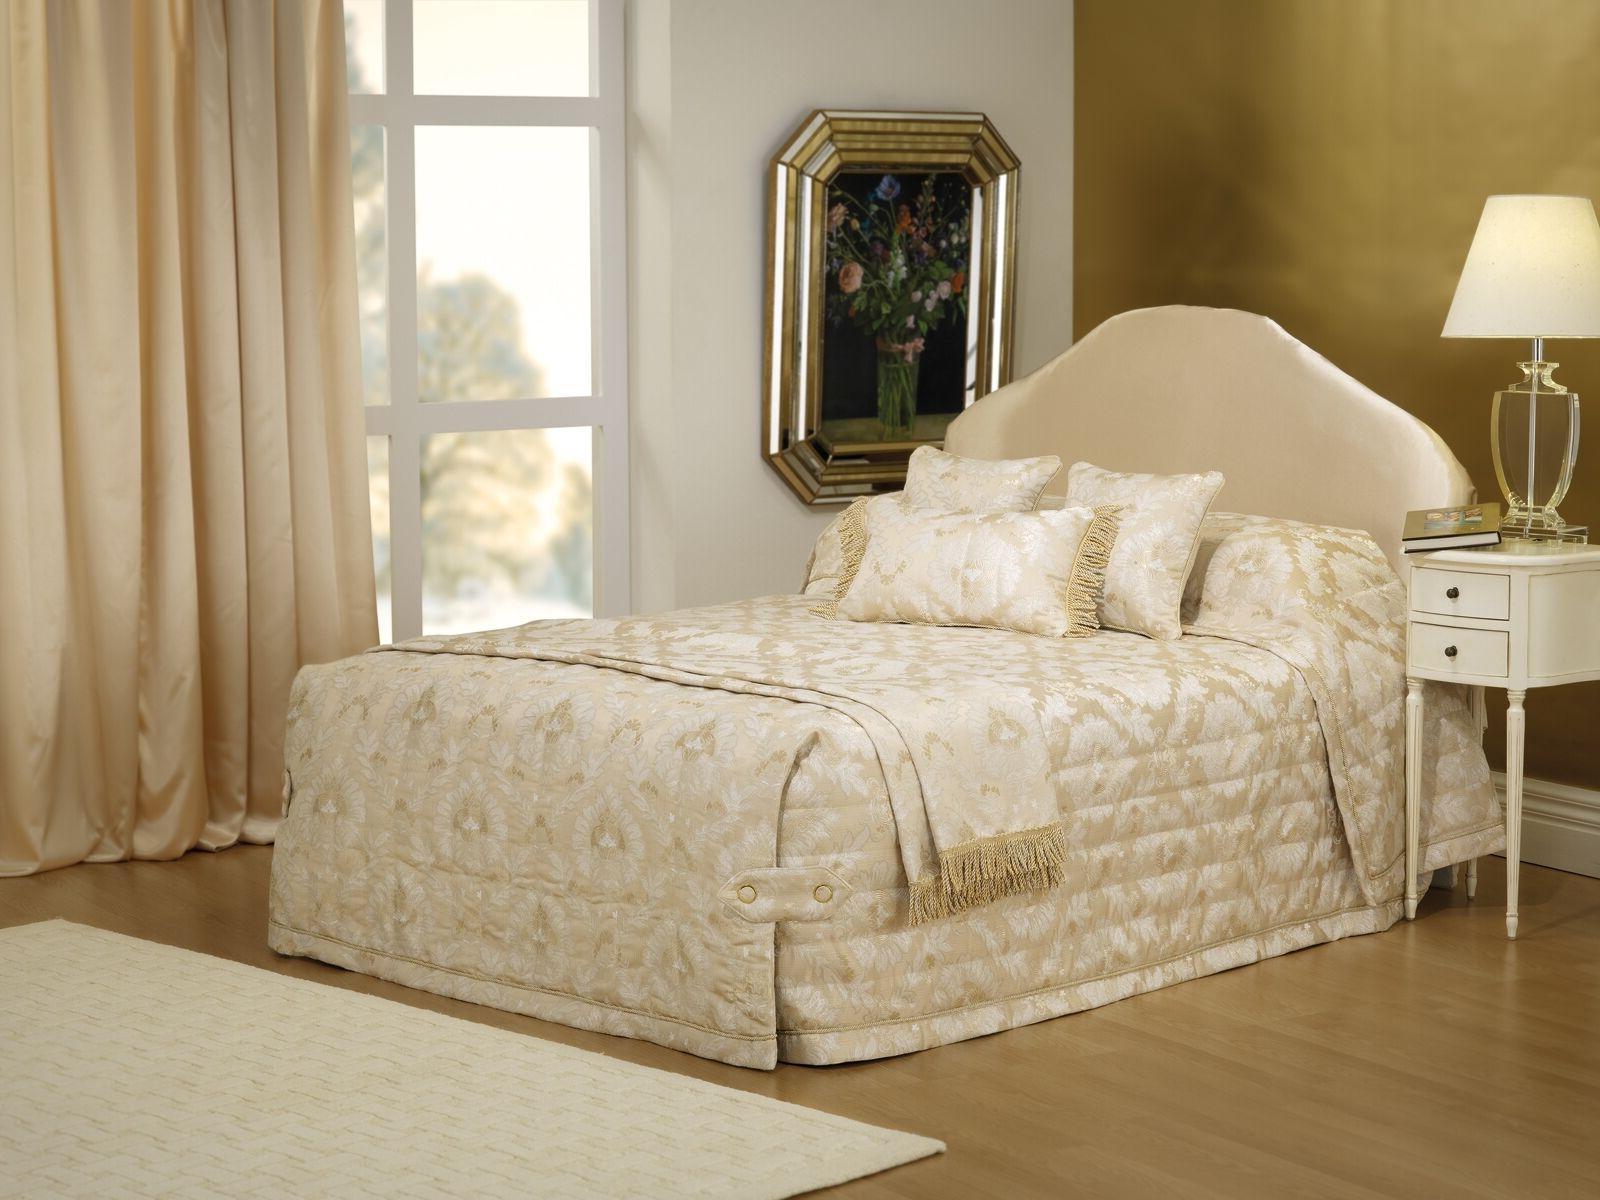 Bianca Buckingham Gold Bedspread Set in All Sizes